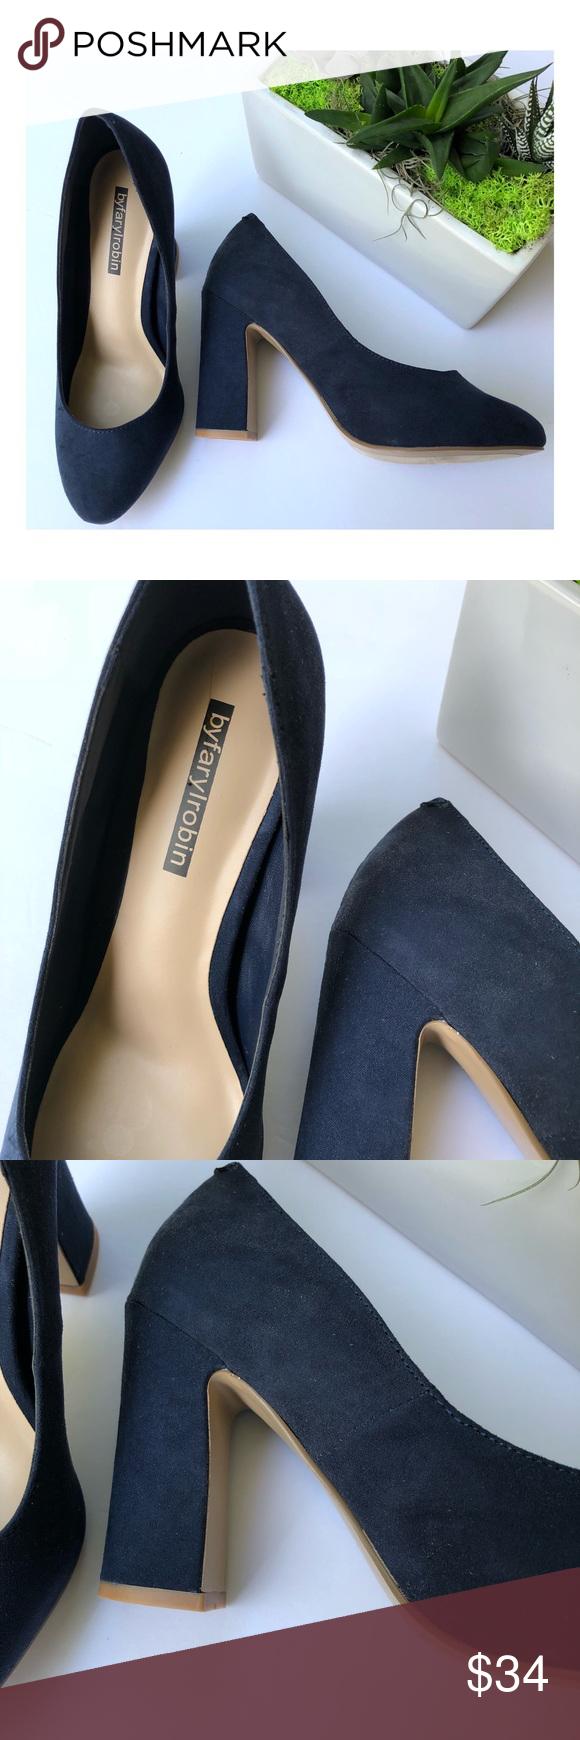 ef529a335e73 Faryl robin Stella Block Heel Almond Toe Pumps Women s by Farylrobin Stella  Block Heel Almond Toe Pumps Size 6 Farylrobin Shoes Heels